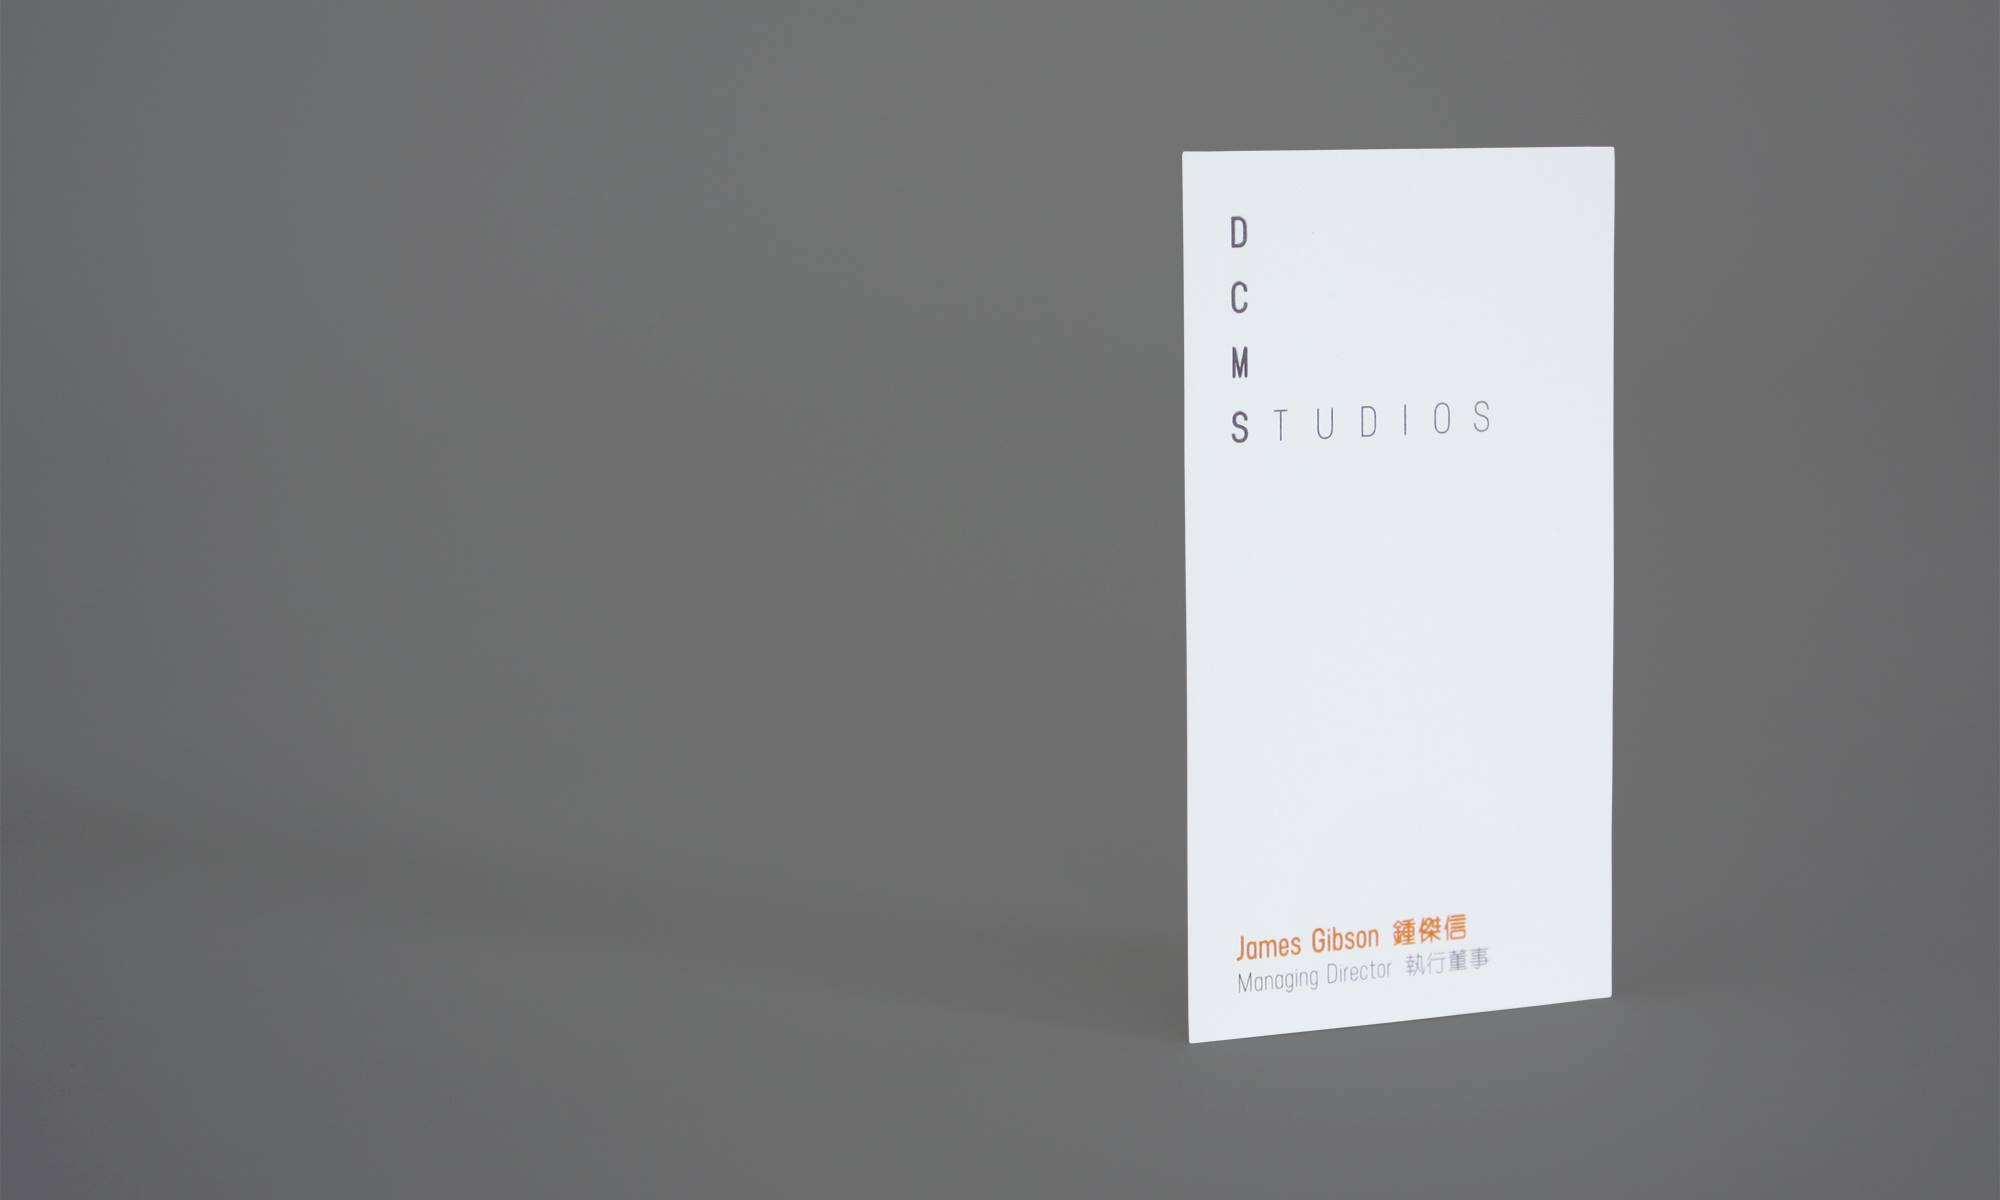 Hwang_Concepts_HKUST_eBook_Foreword